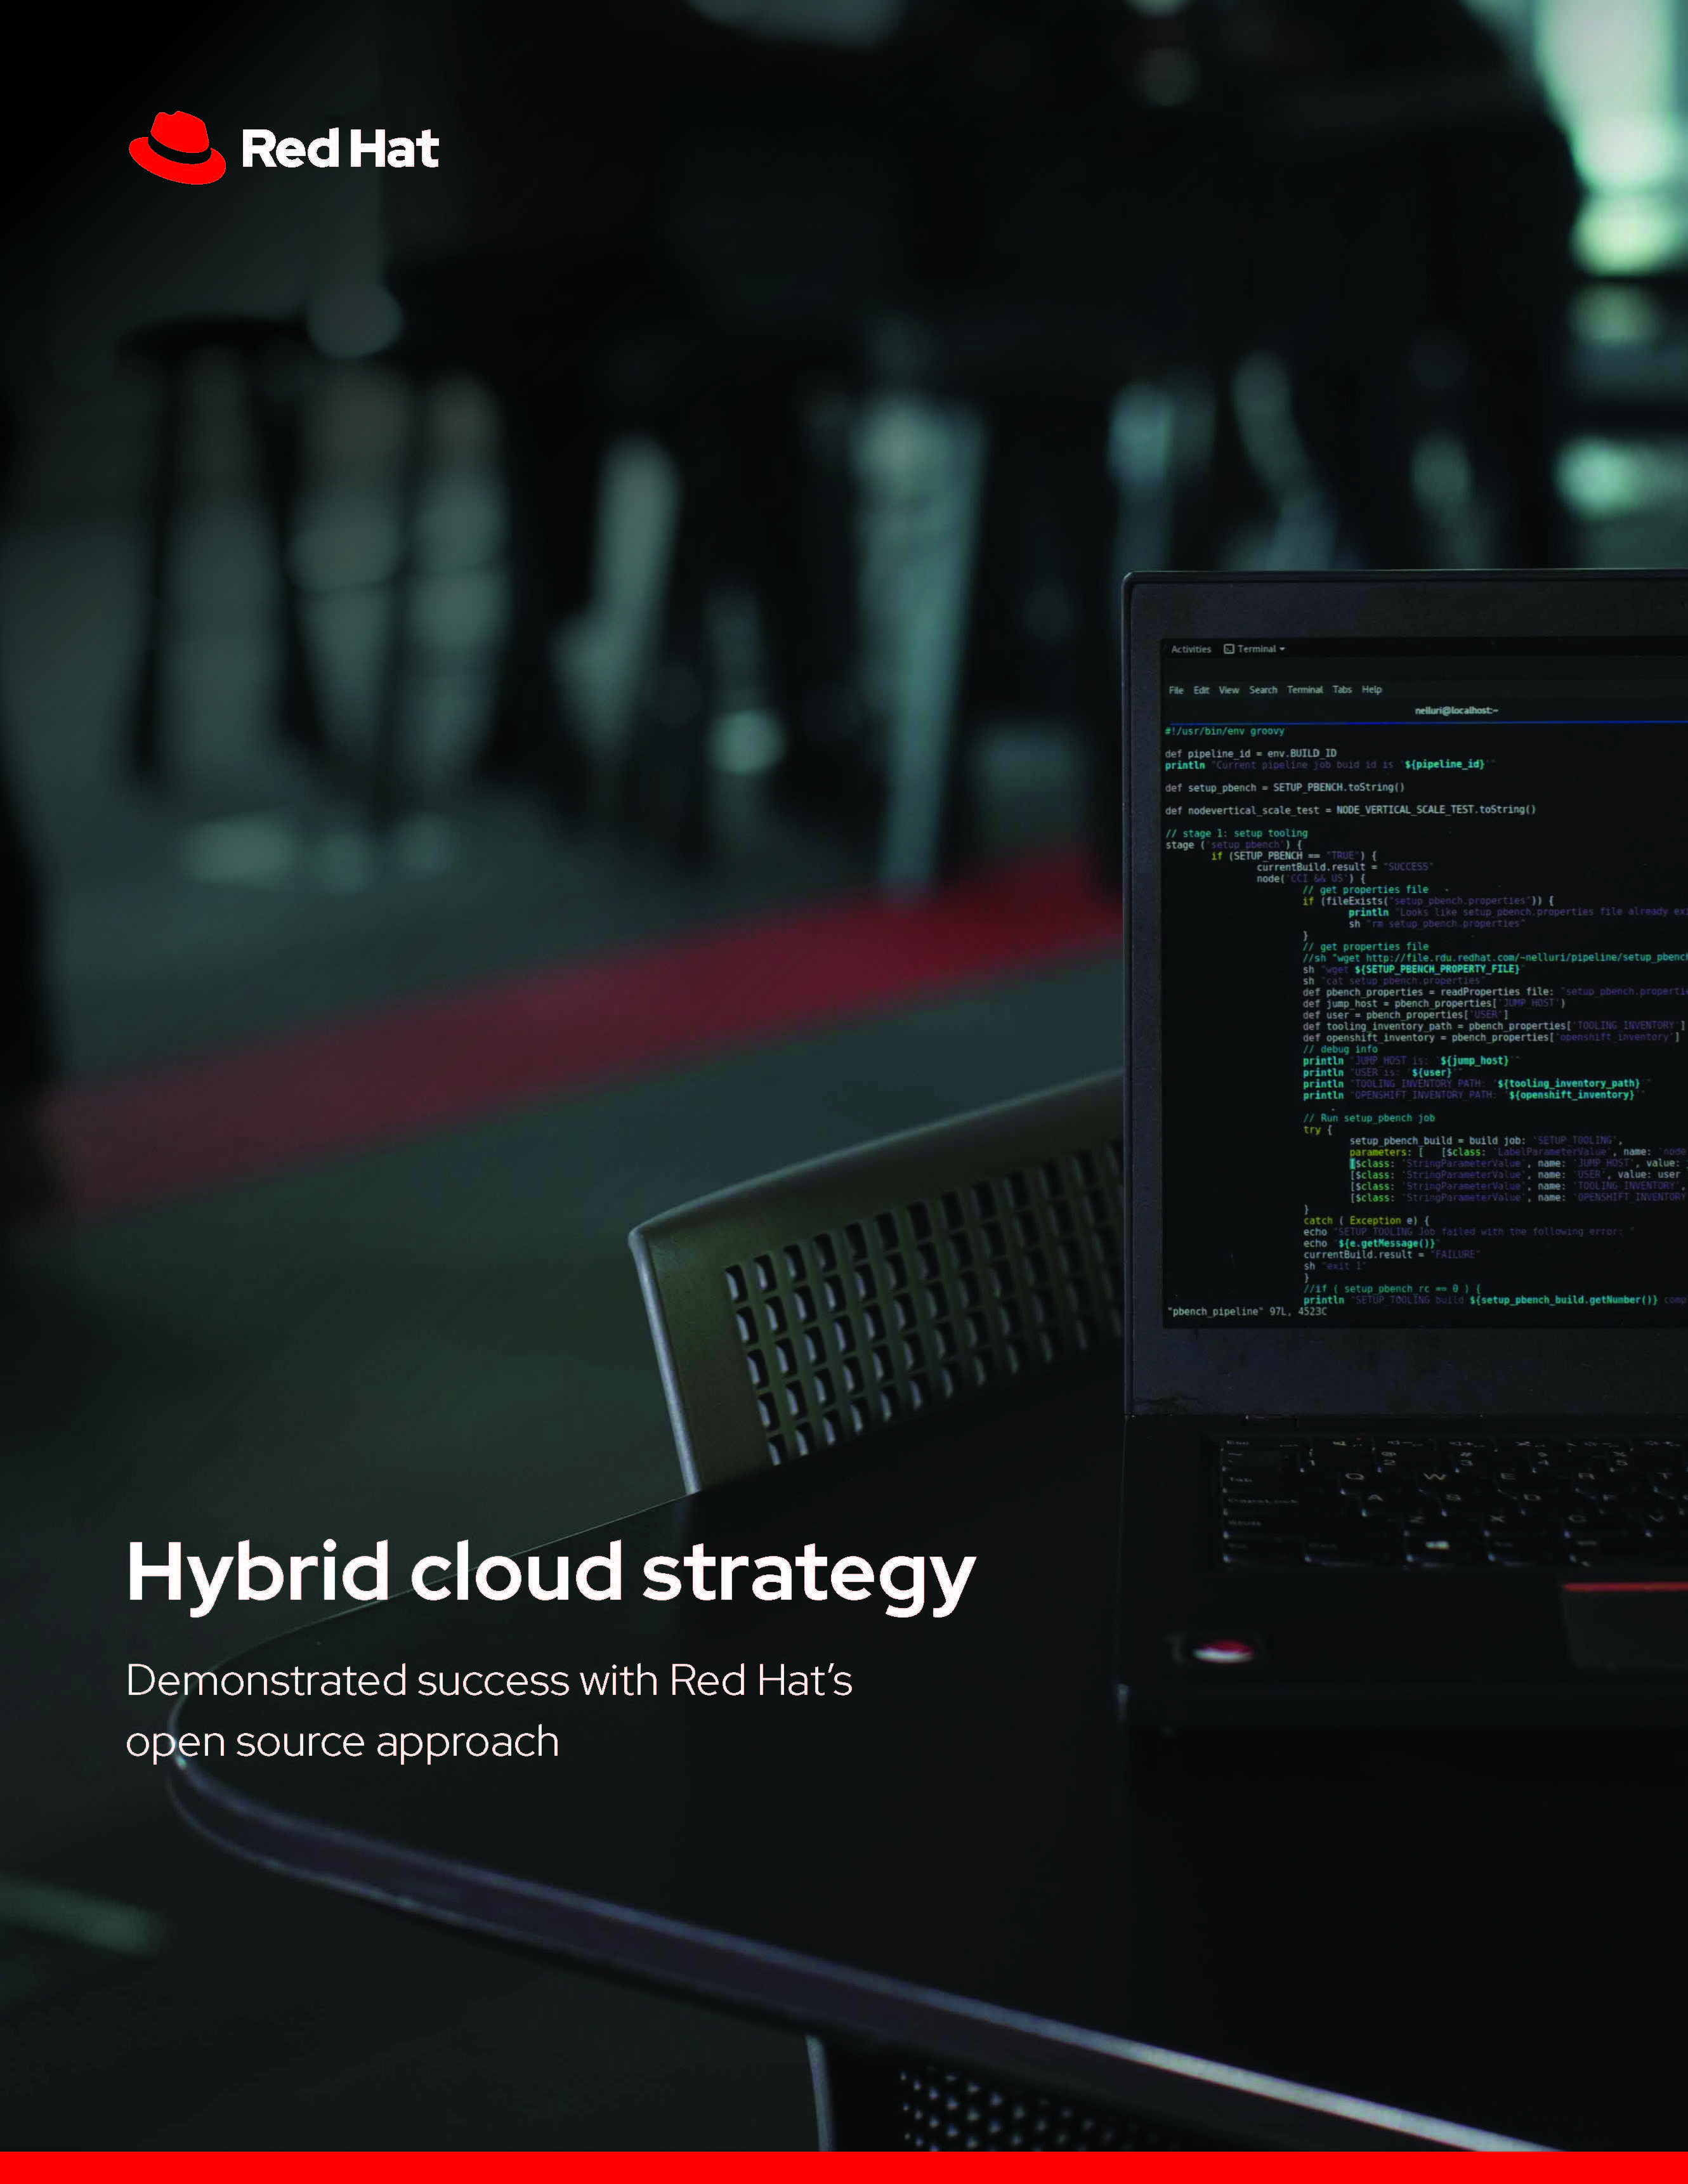 cm-hybrid-cloud-strategy-customer-success-ebook-f14206-201904-en_Page_01